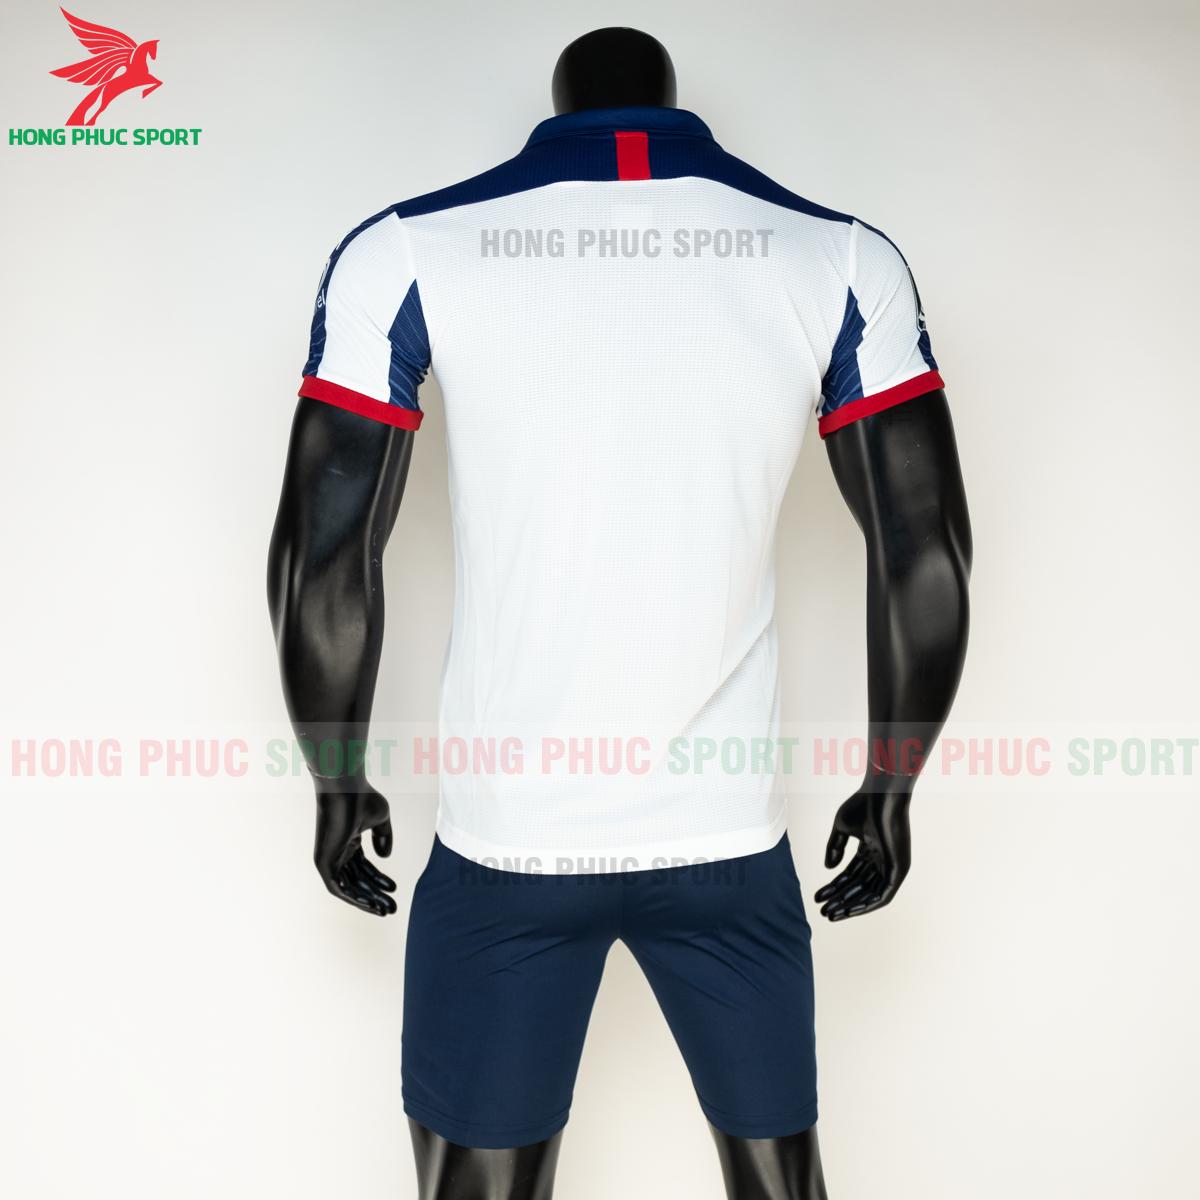 https://cdn.hongphucsport.com/unsafe/s4.shopbay.vn/files/285/ao-bong-da-rayados-20-21-san-nha-hang-thailand-8-5faf5d4dbd6fe.png